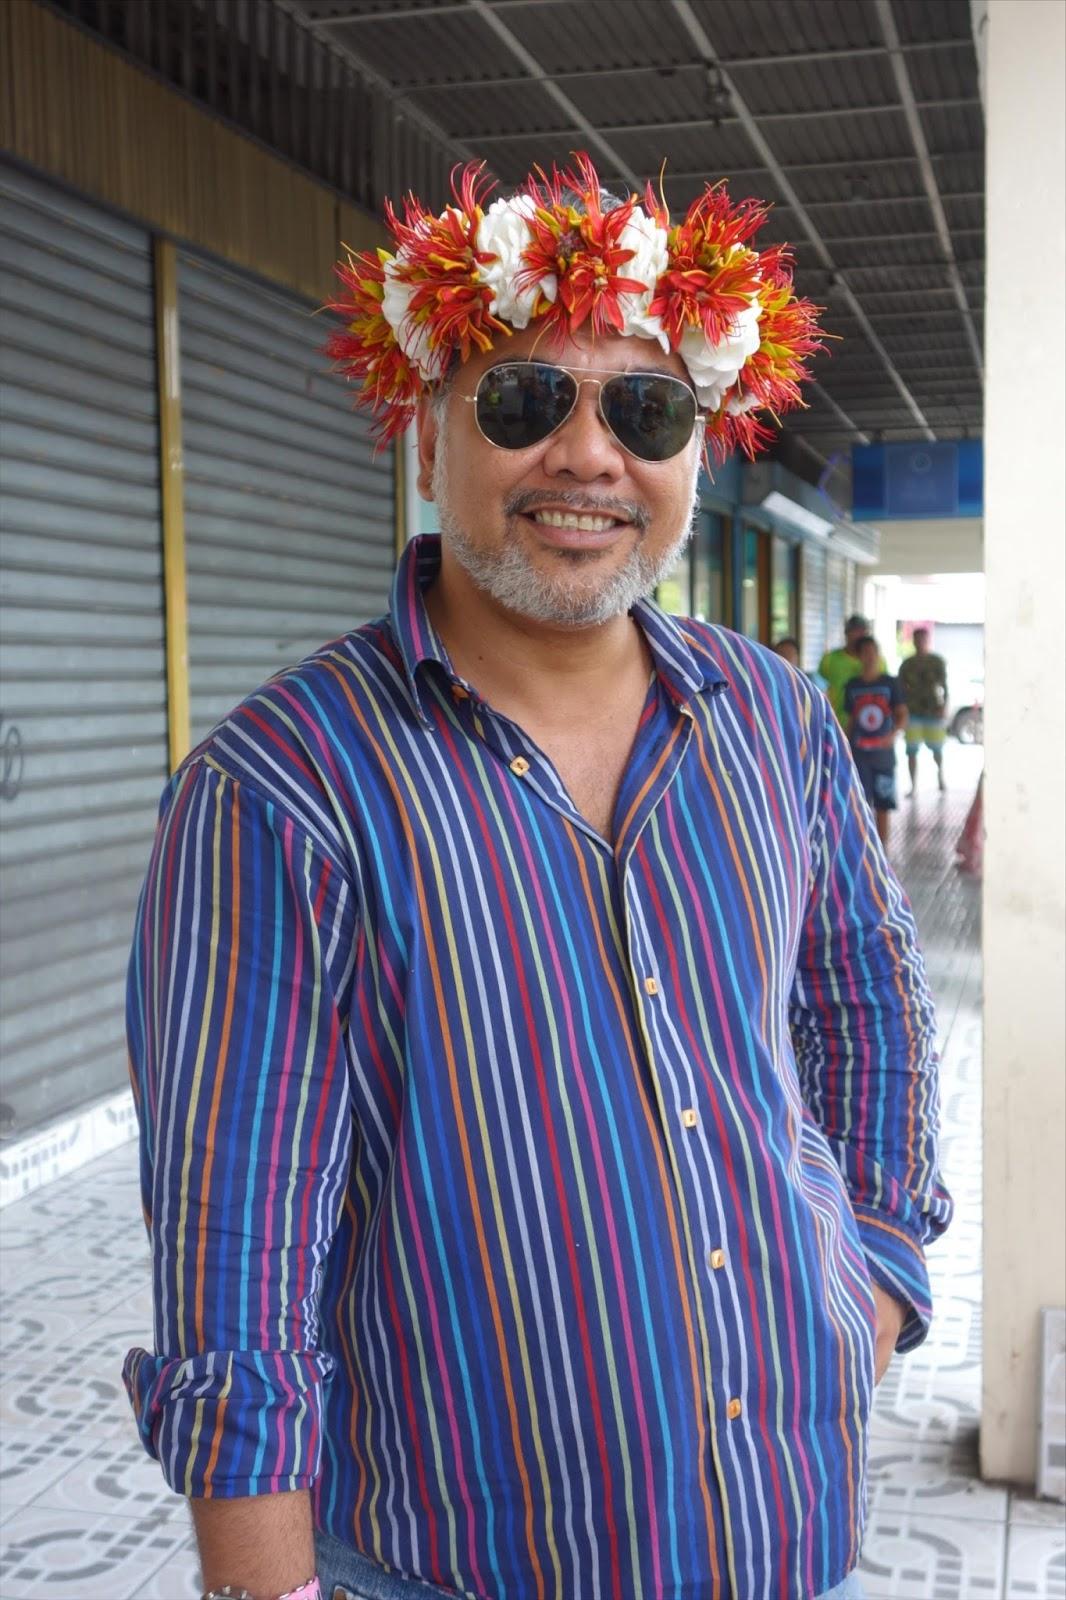 raerae de tahiti rencontre du troisième type